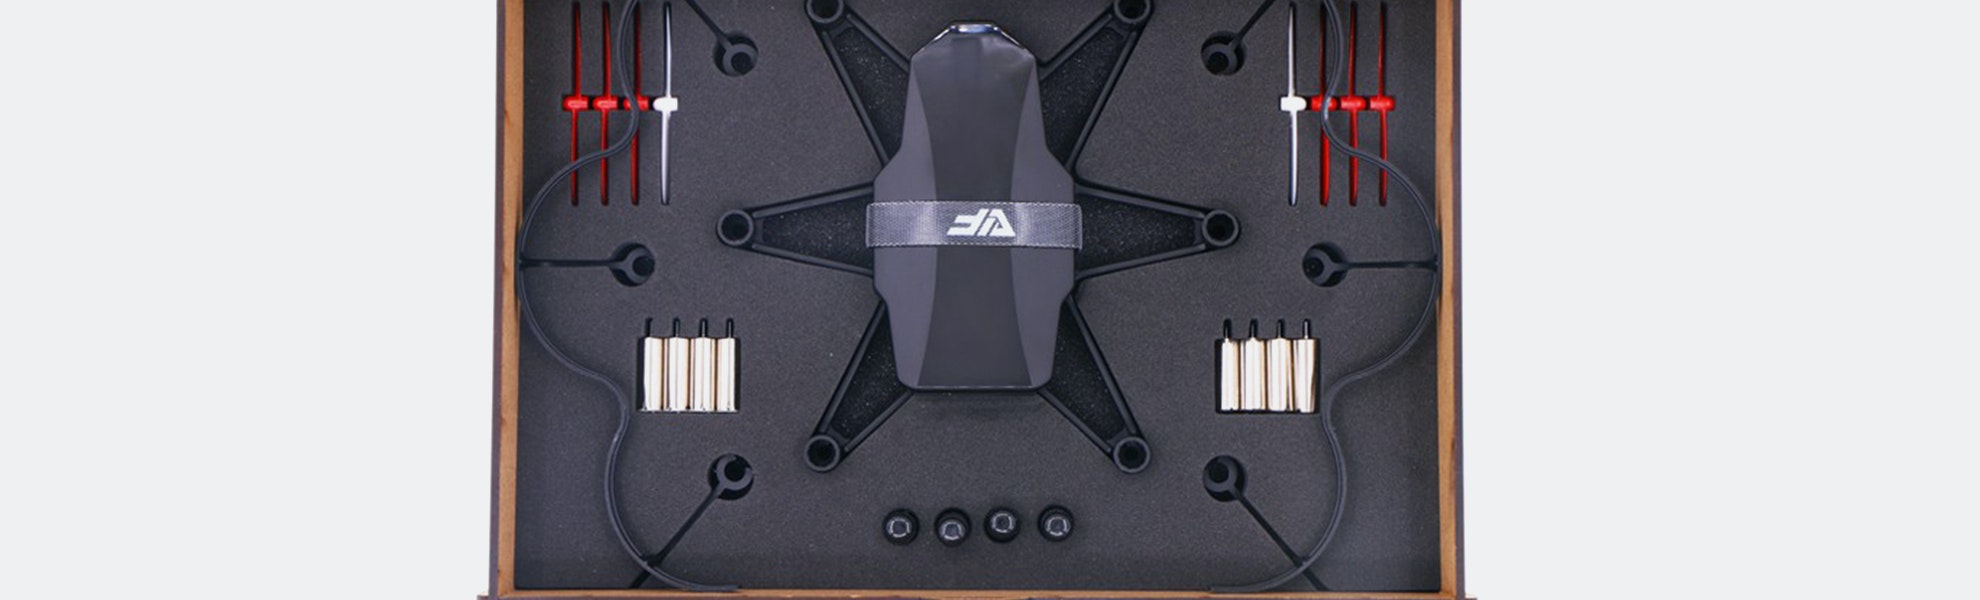 ELF II - VR Drone Kit for STEM Education